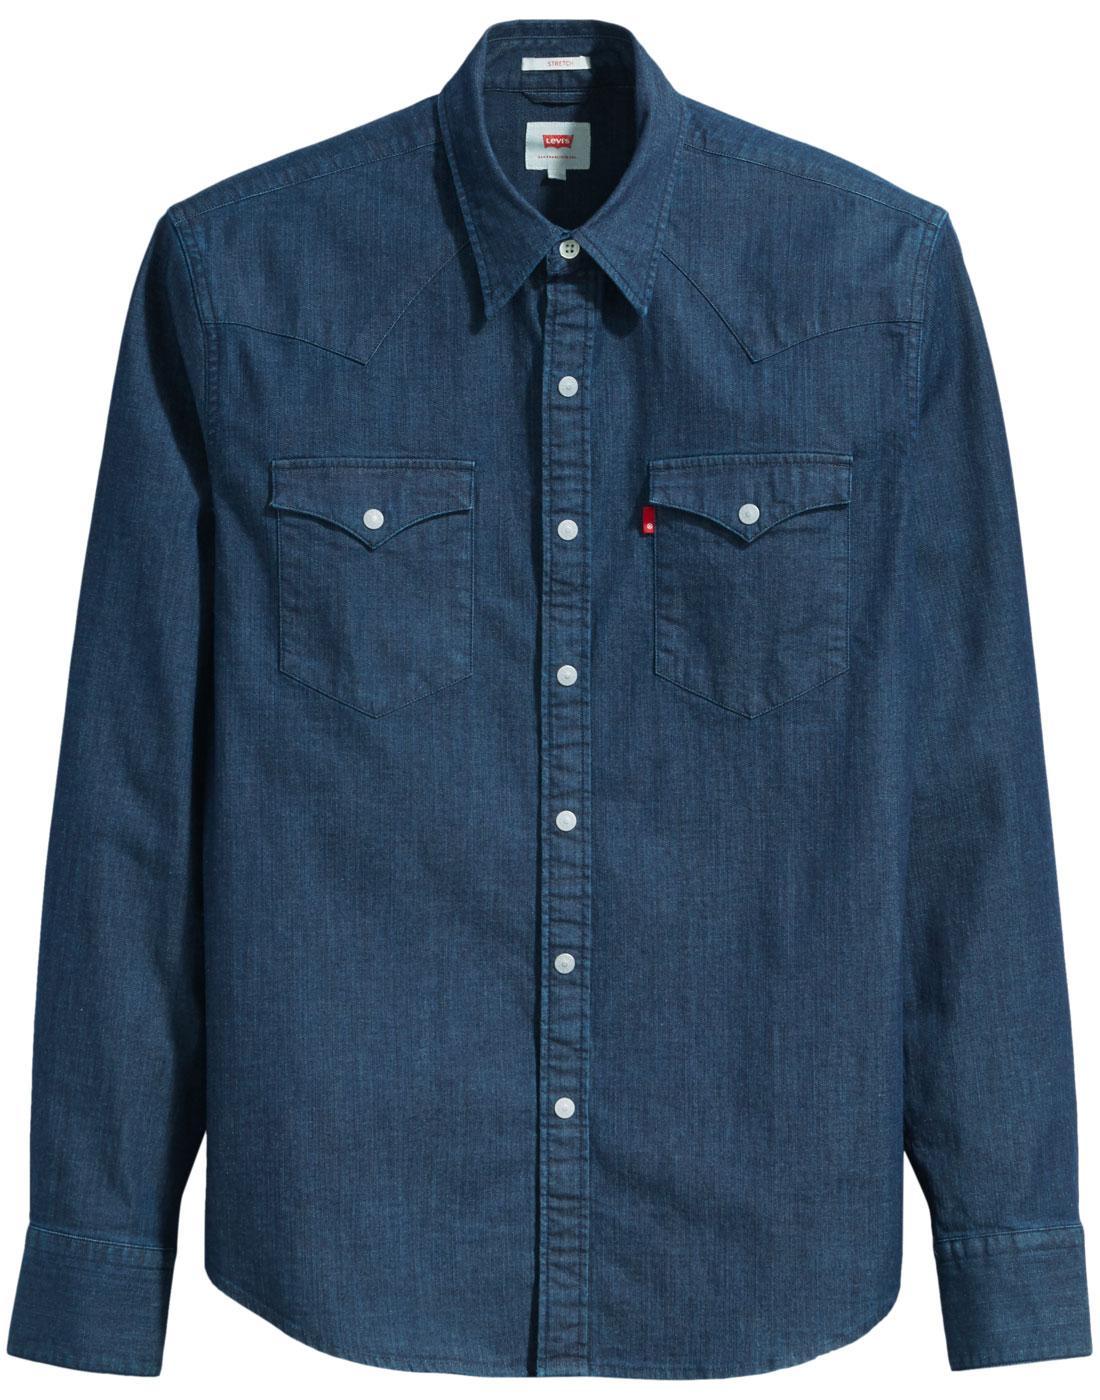 LEVI'S Barstow Retro 70s Denim Western Shirt (MIS)